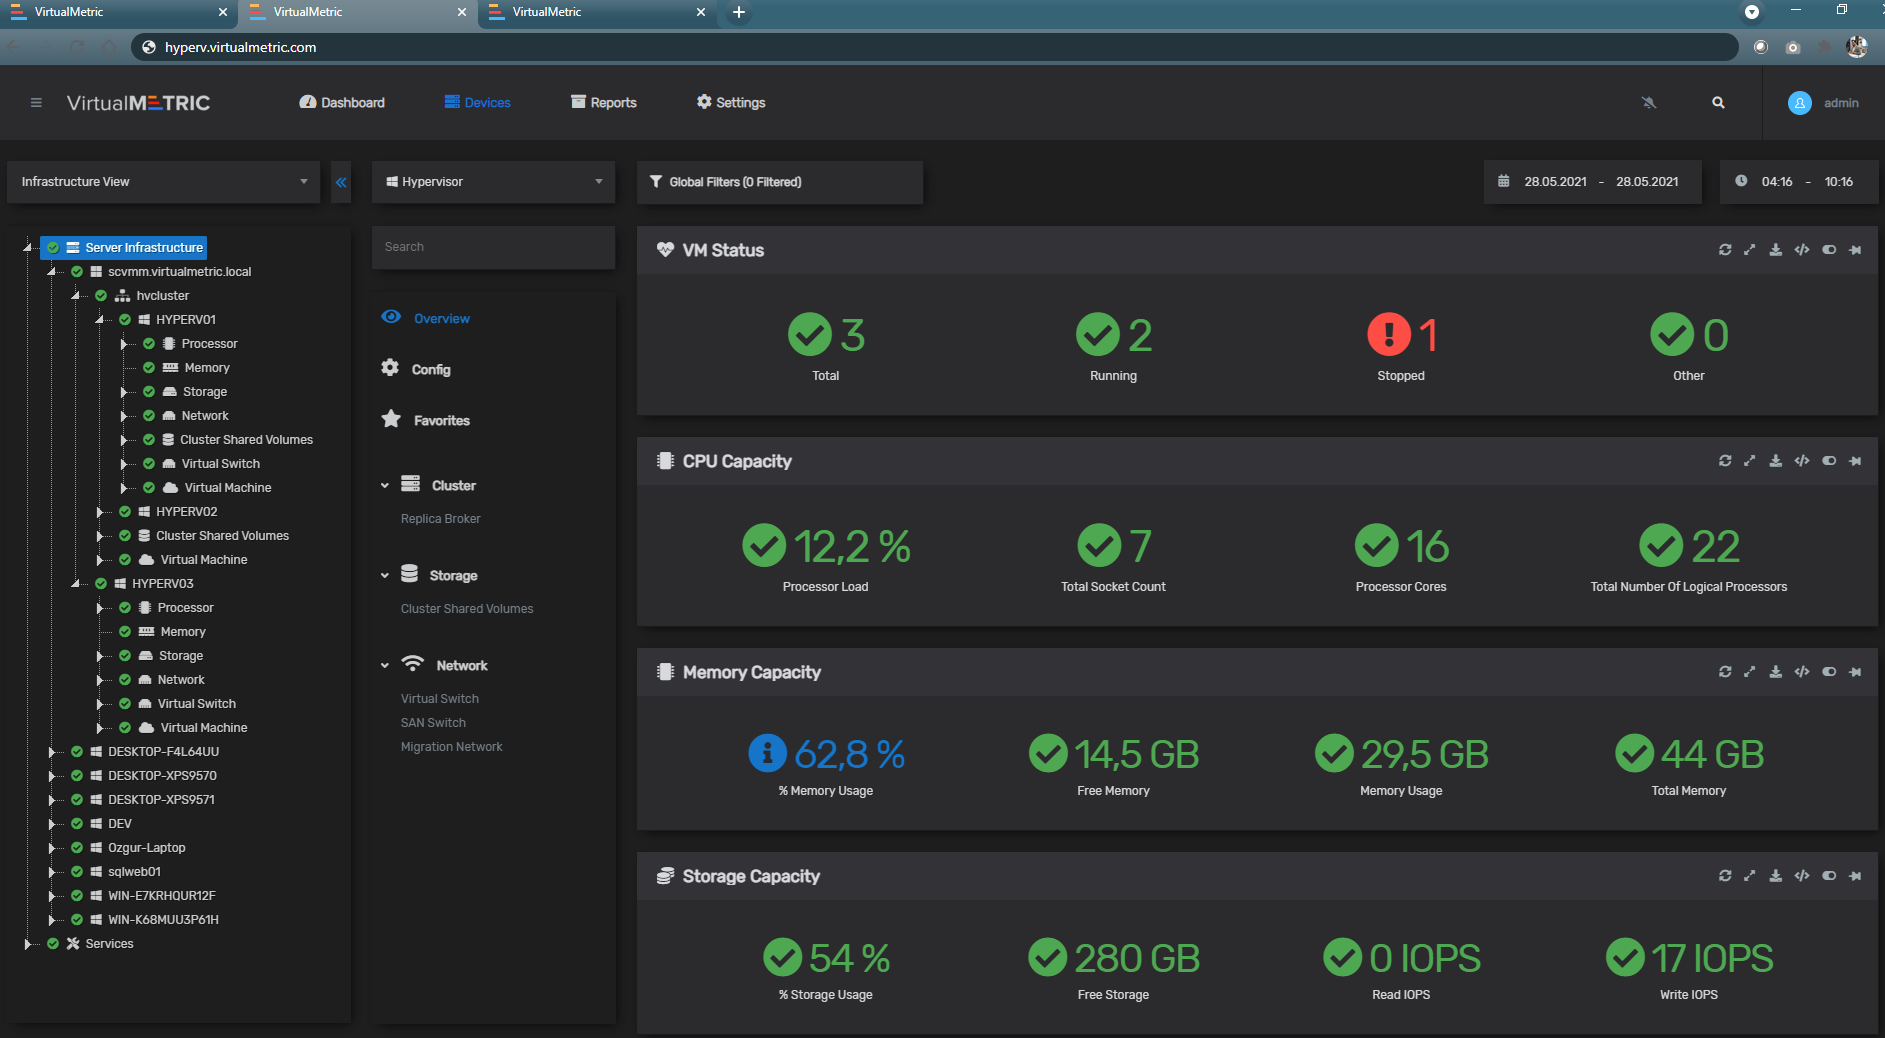 Web-based Hyper-V Monitoring